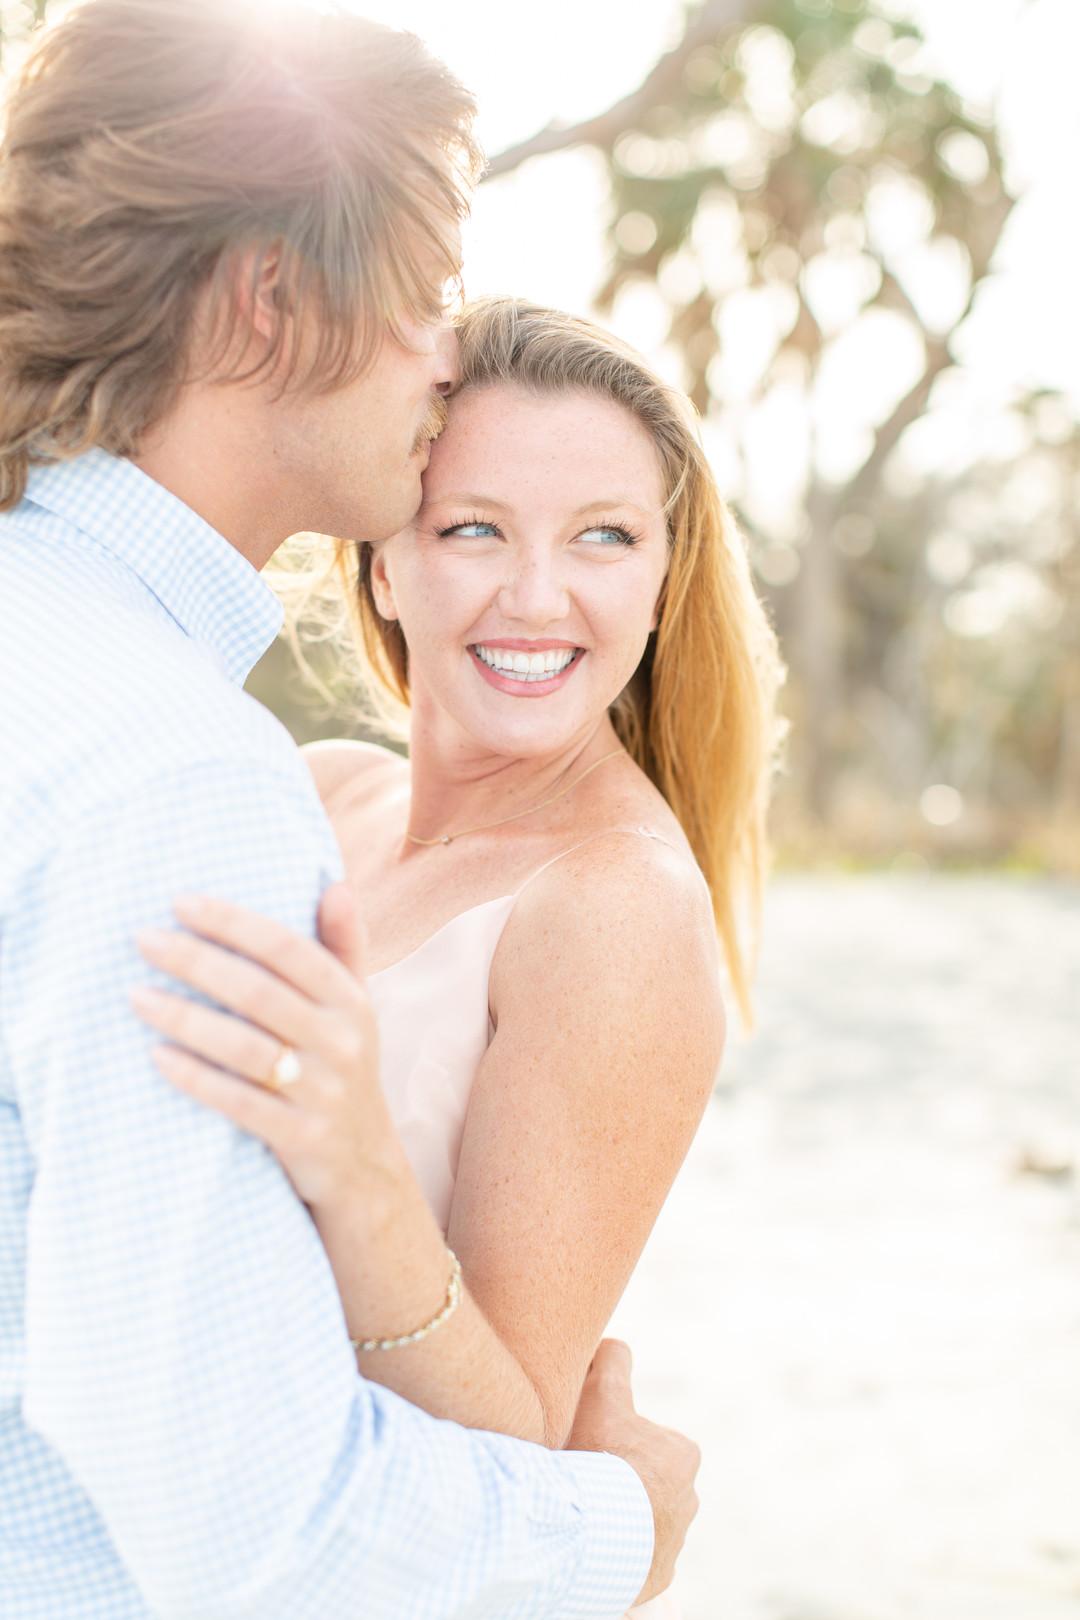 jekyll-island-wedding-engagement-photography-2.jpg